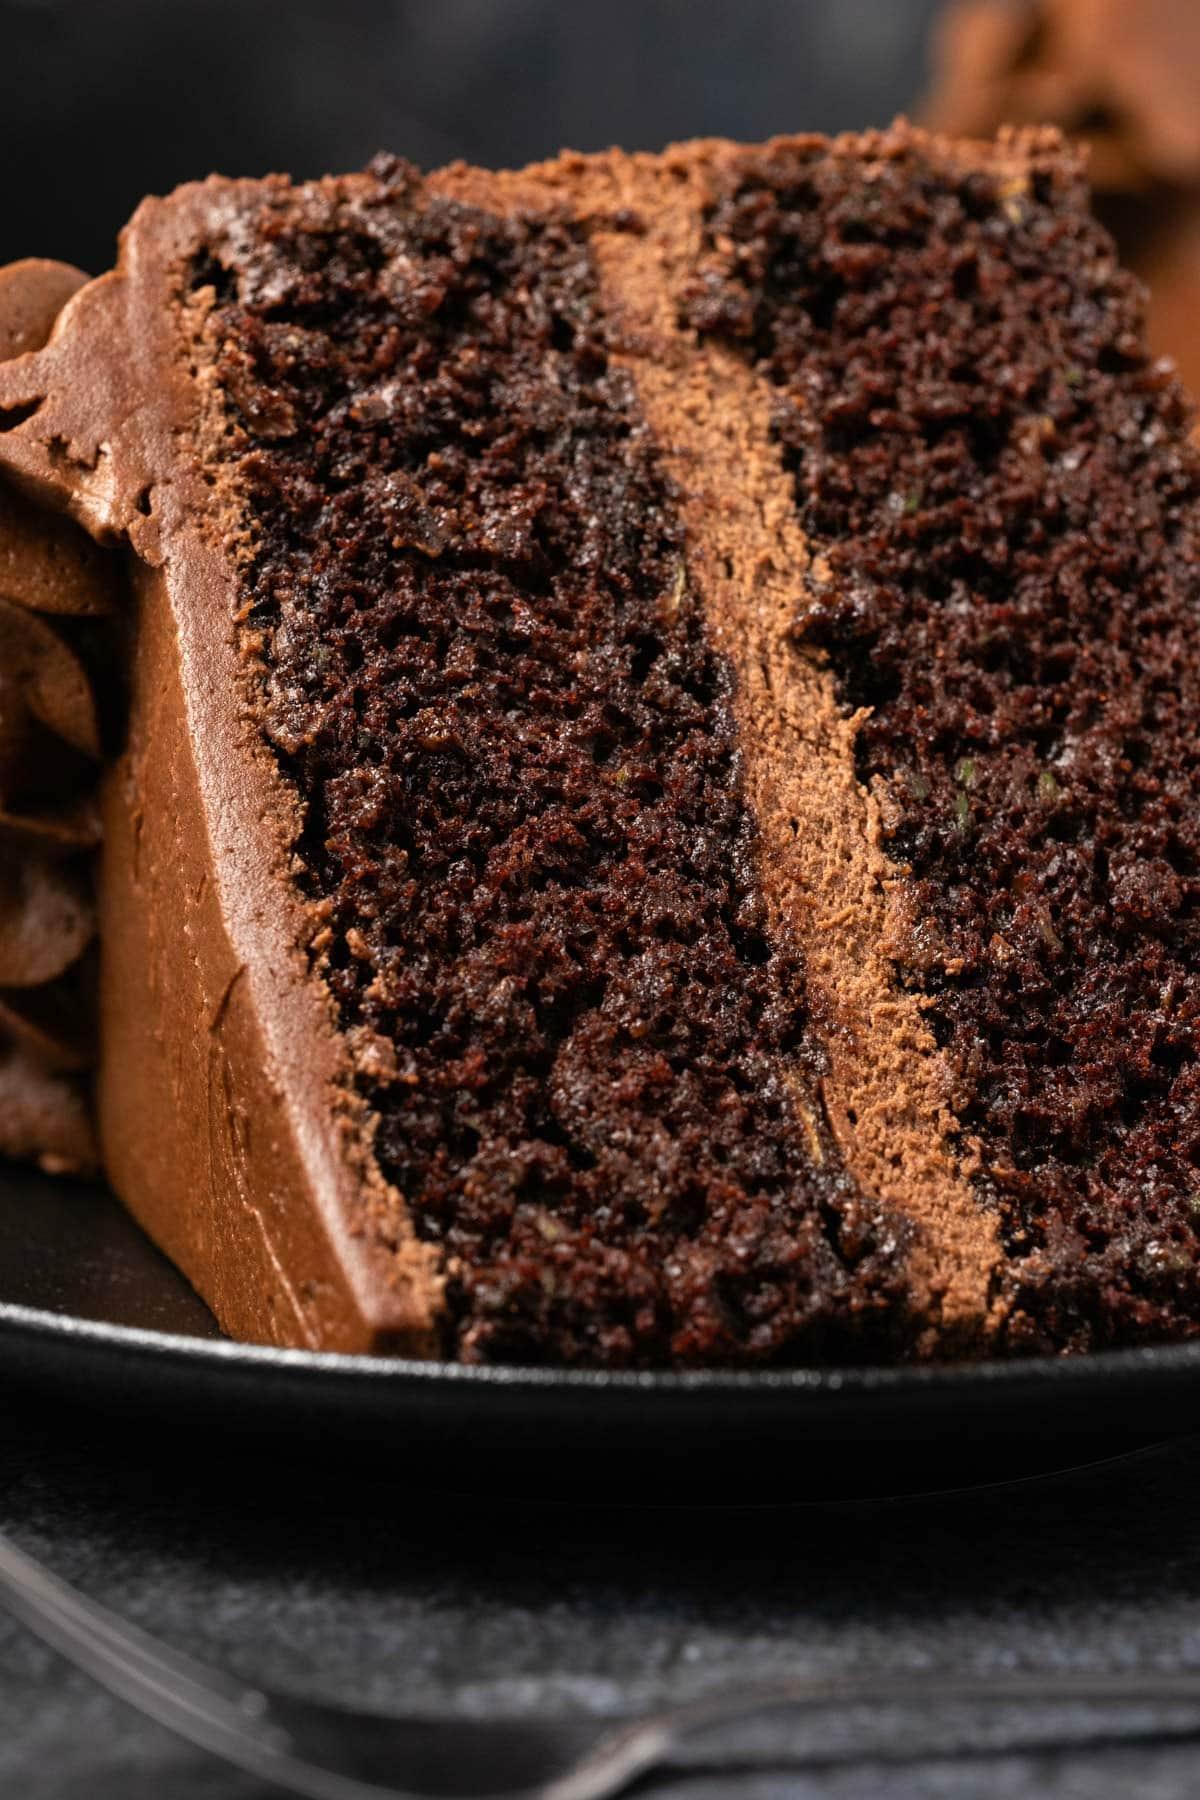 Slice of chocolate cake on a black plate.